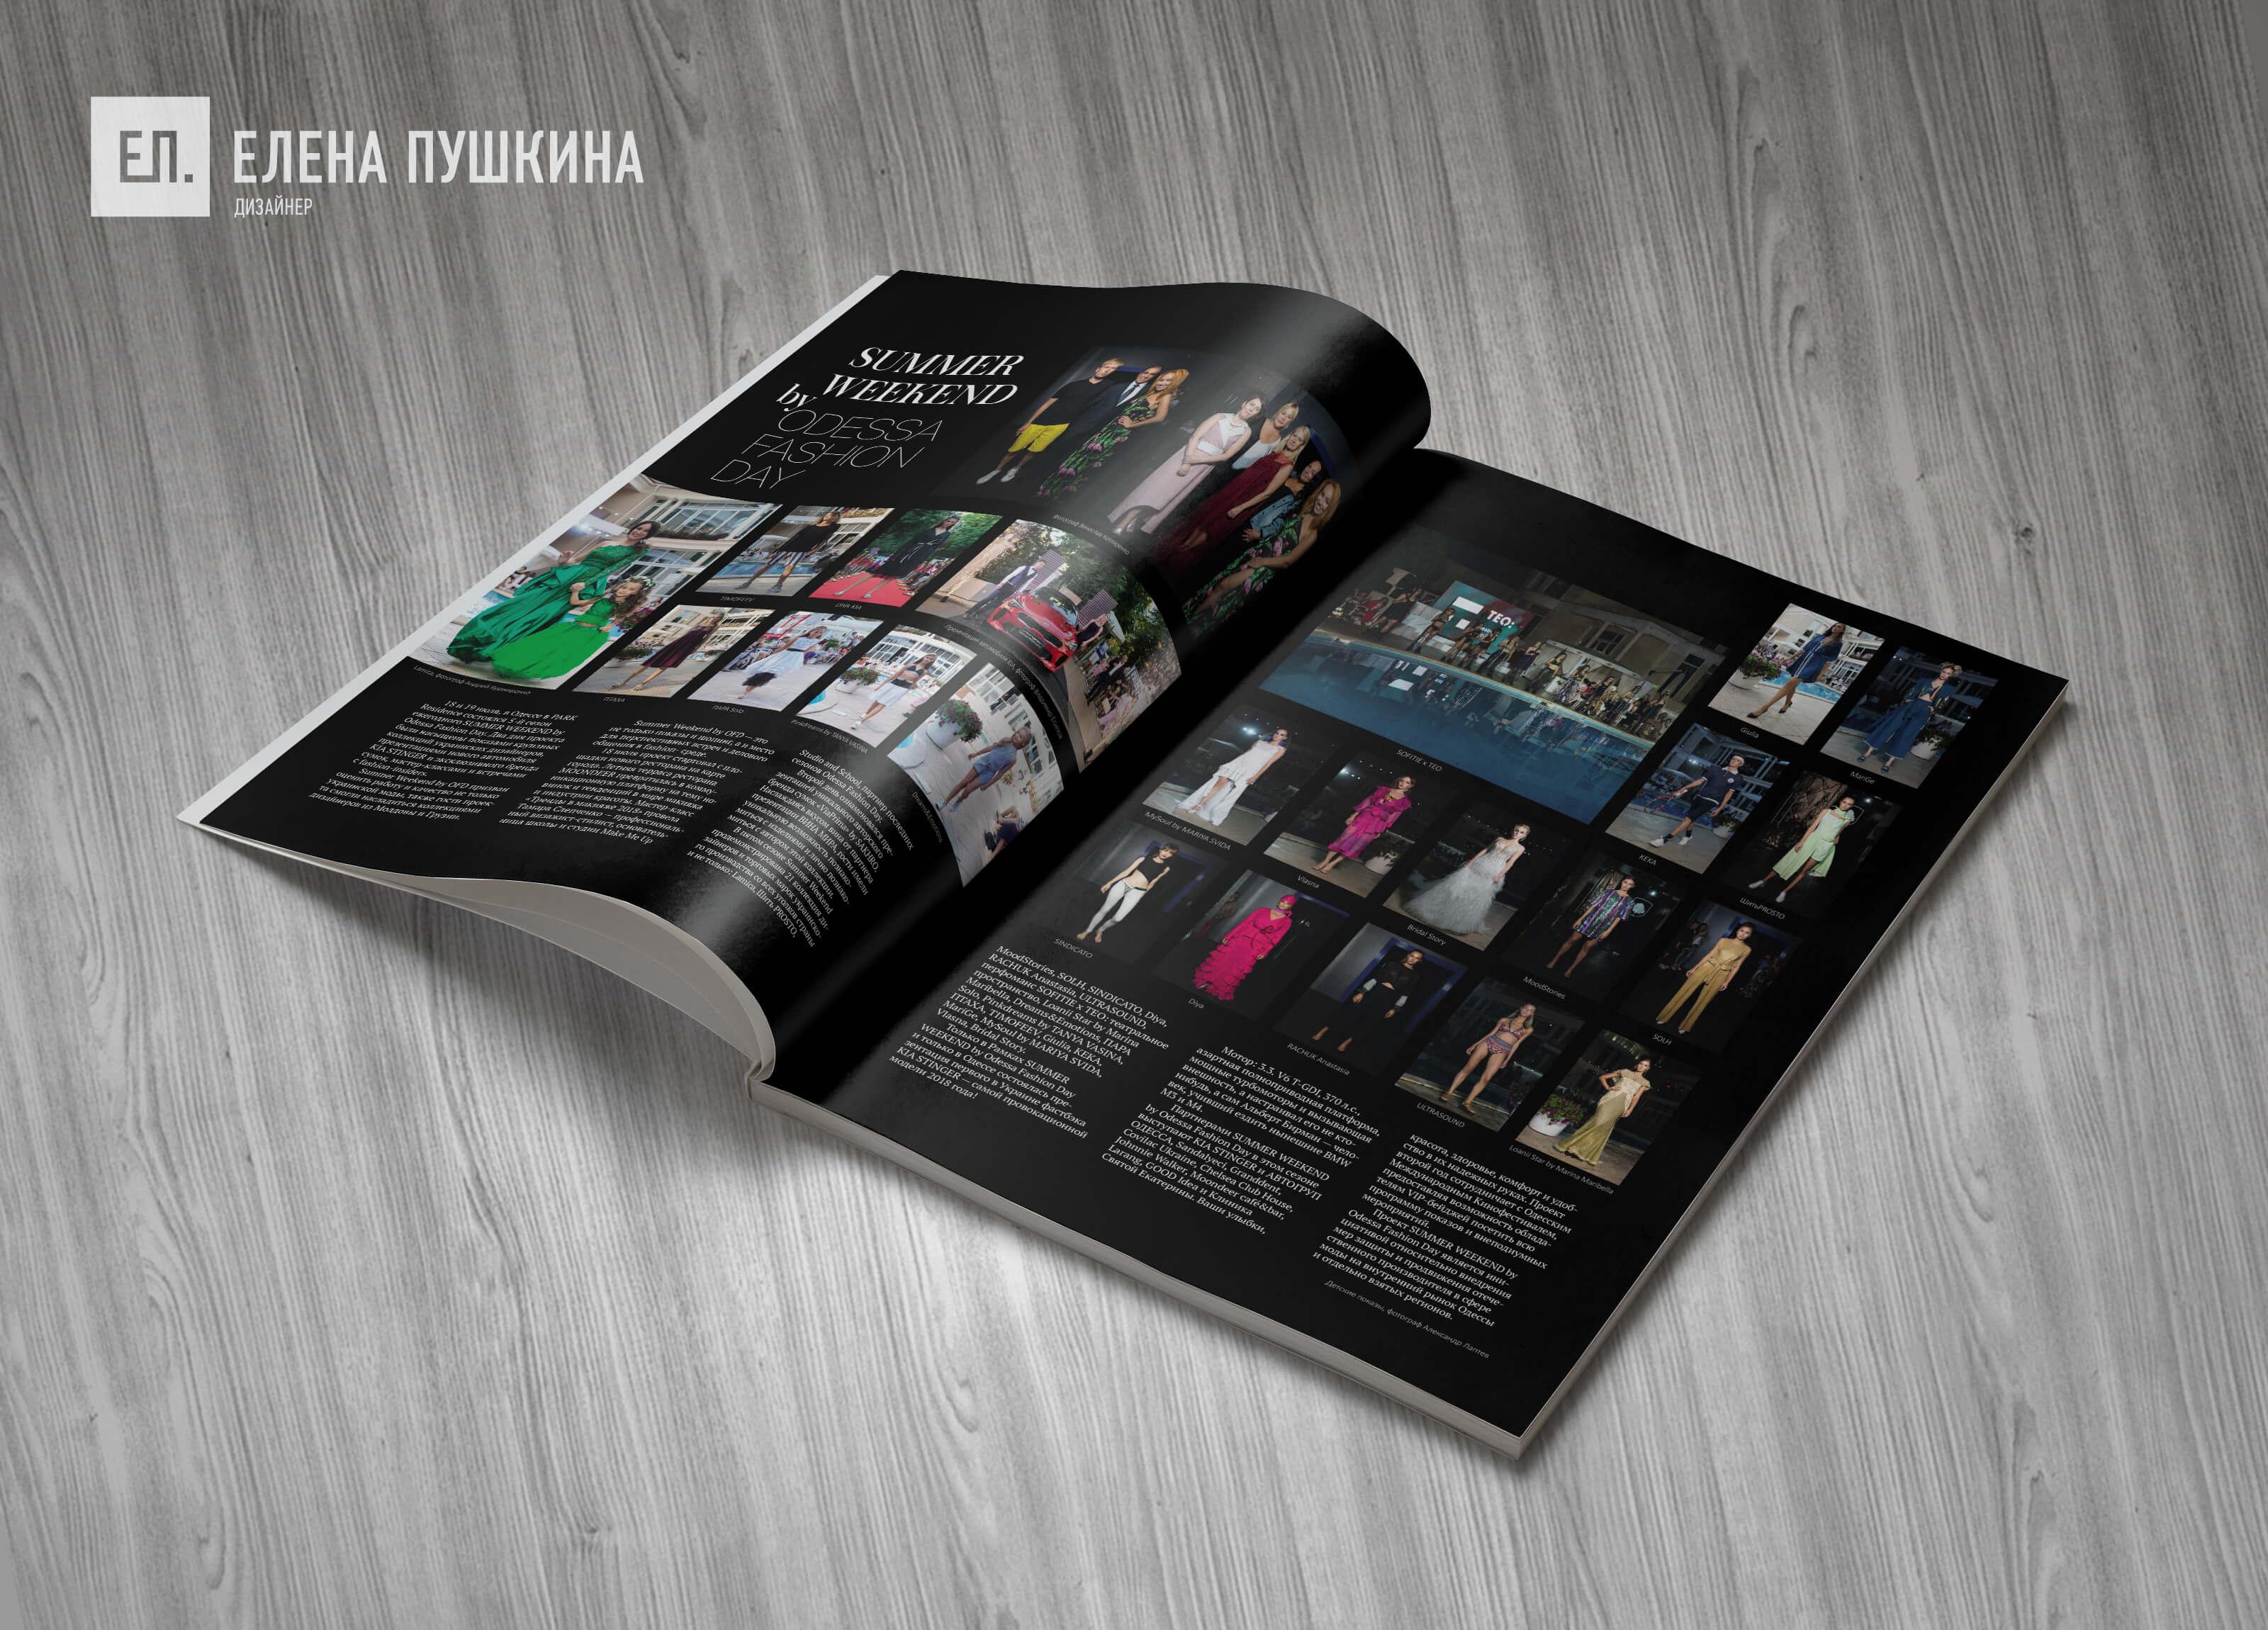 Глянцевый журнал «CoolBaba» №44 октябрь 2018 — разработка дизайна и вёрстка журнала Разработка журналов Портфолио